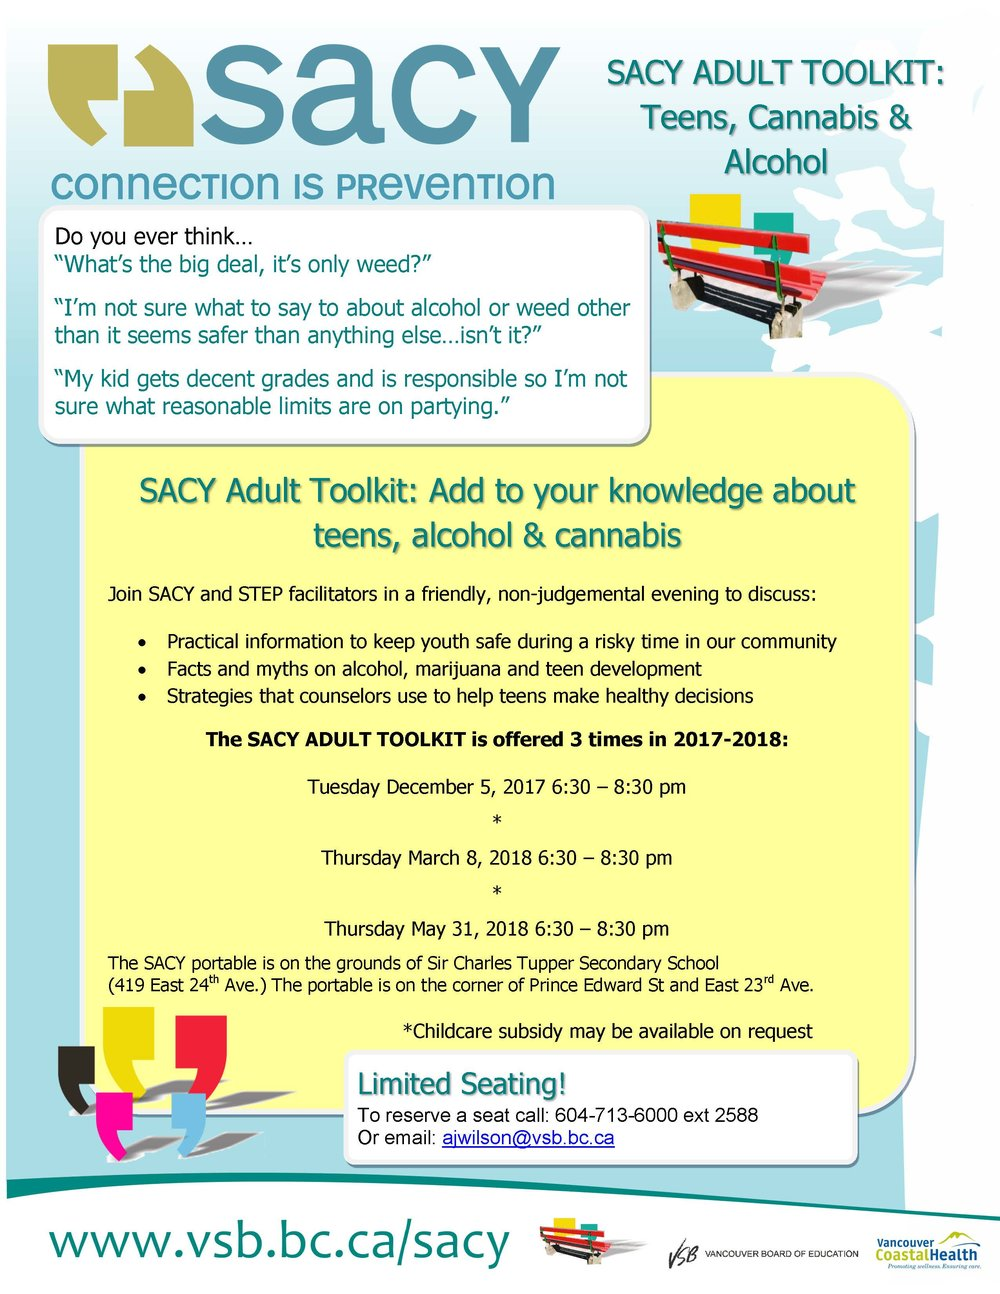 SACY Toolkit poster 2017_18.jpg